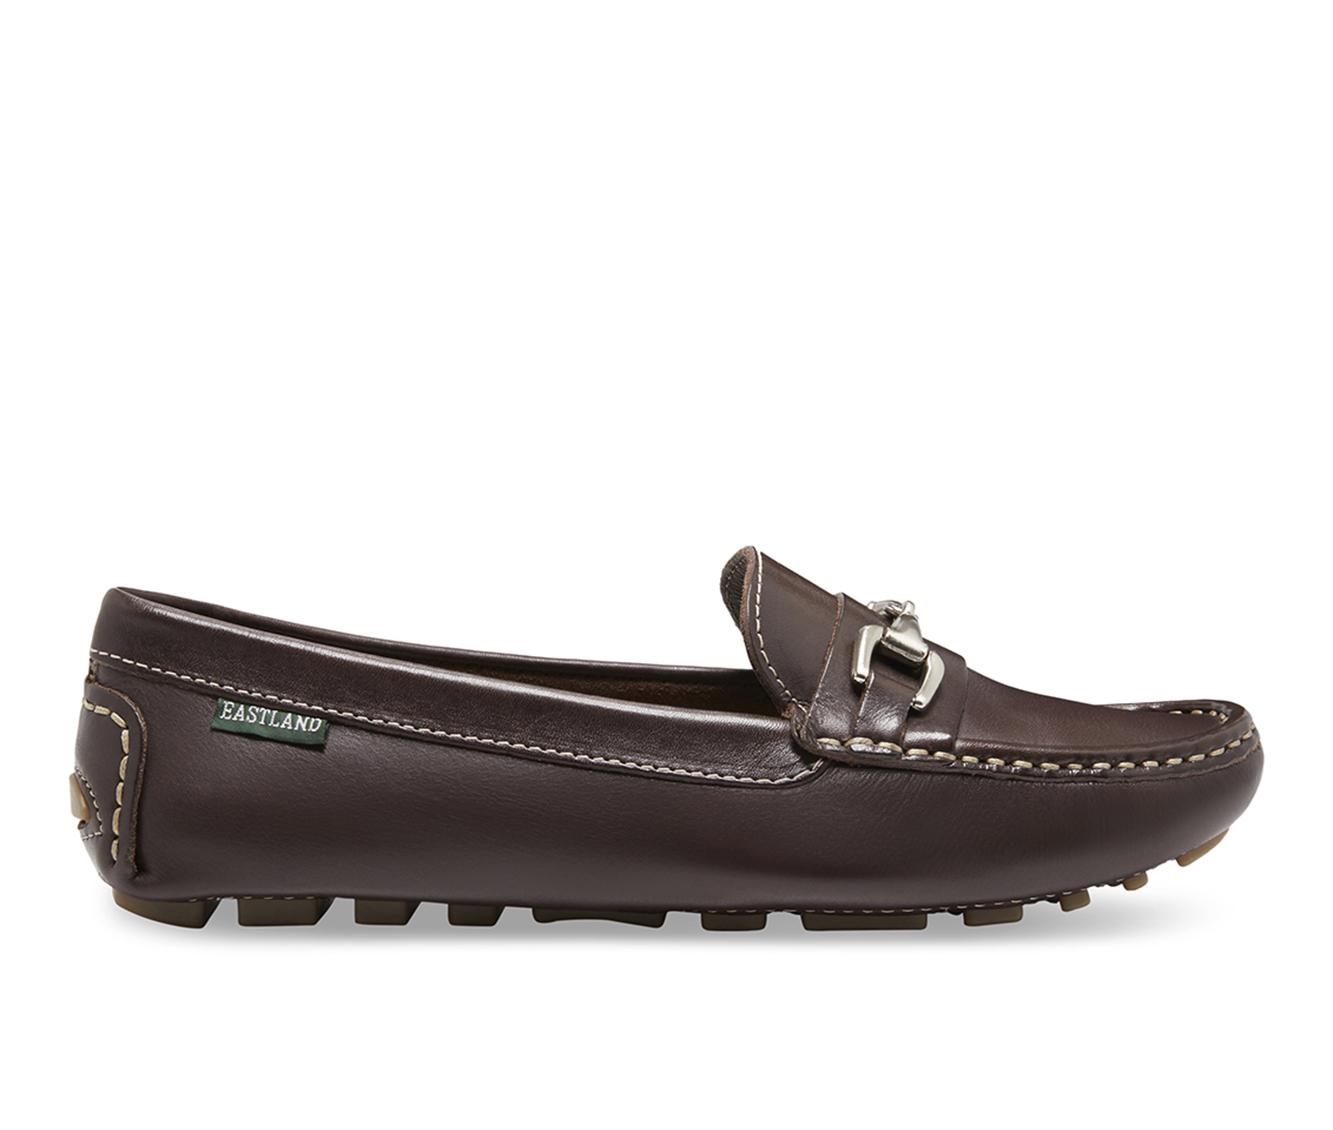 Eastland Olivia Women's Shoe (Brown Leather)